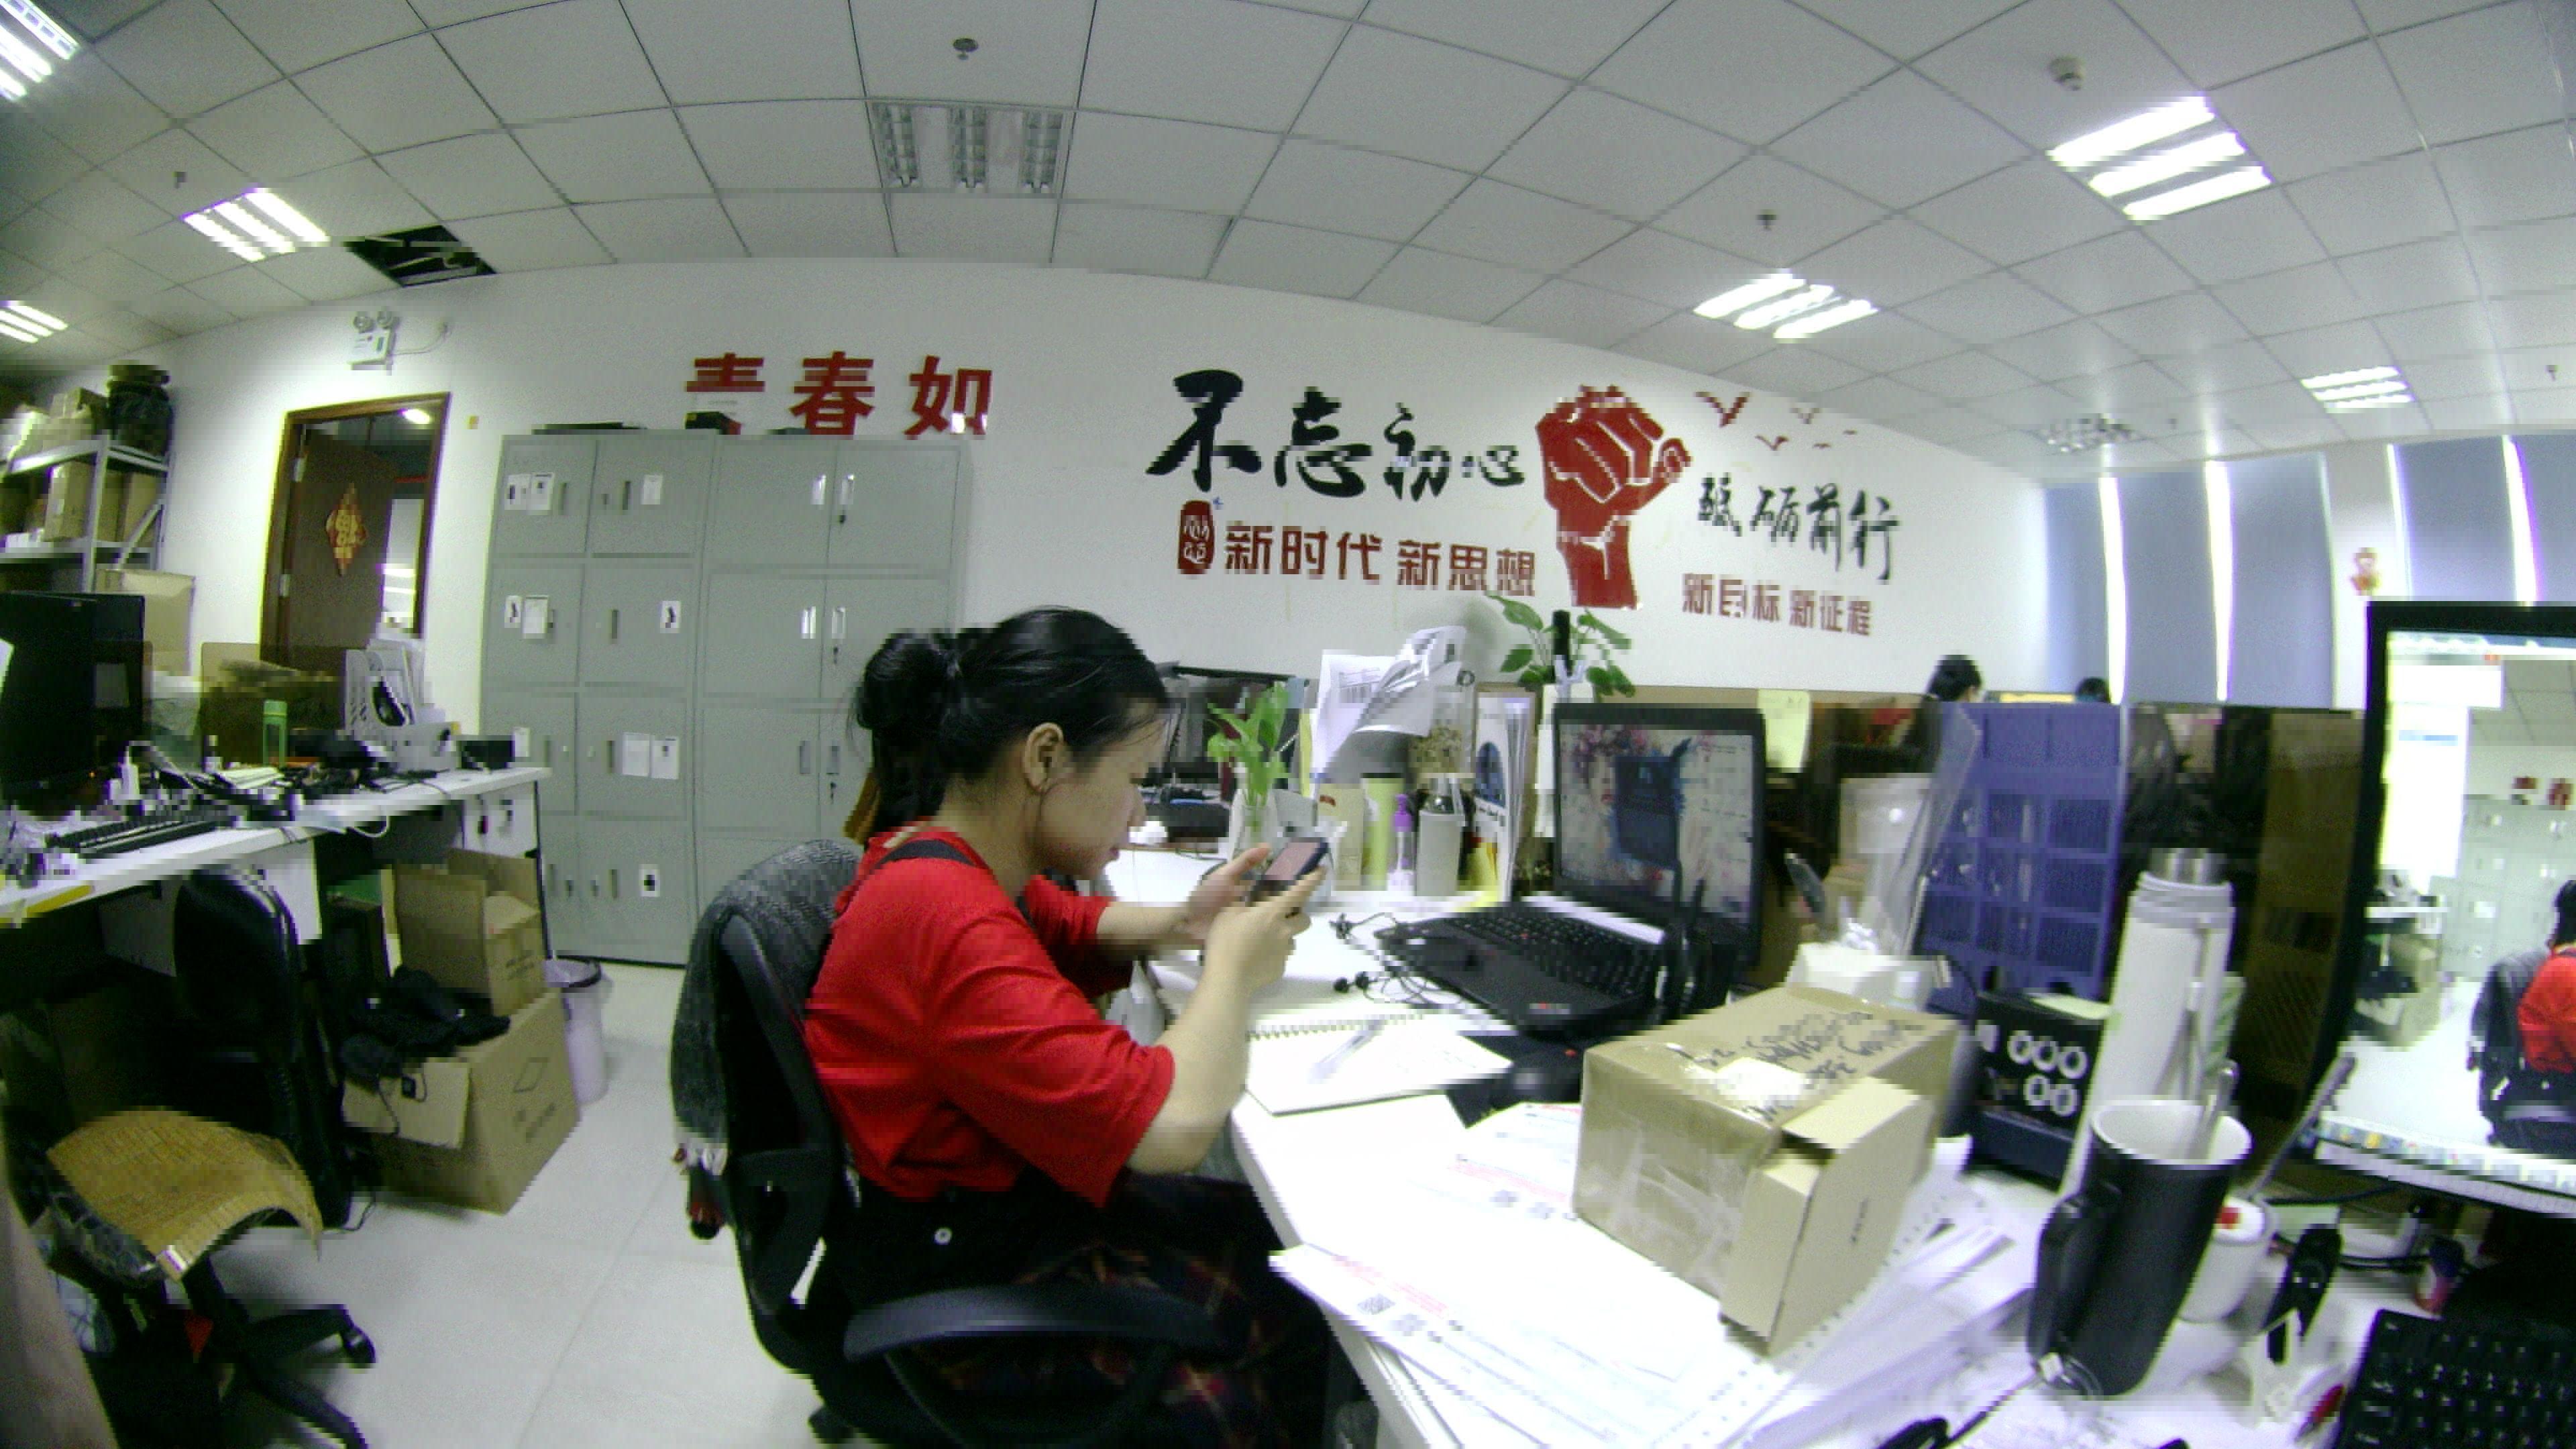 ELP 170 Degree Fisheye 4K USB Webcam MJPEG 30fps 3840x2160